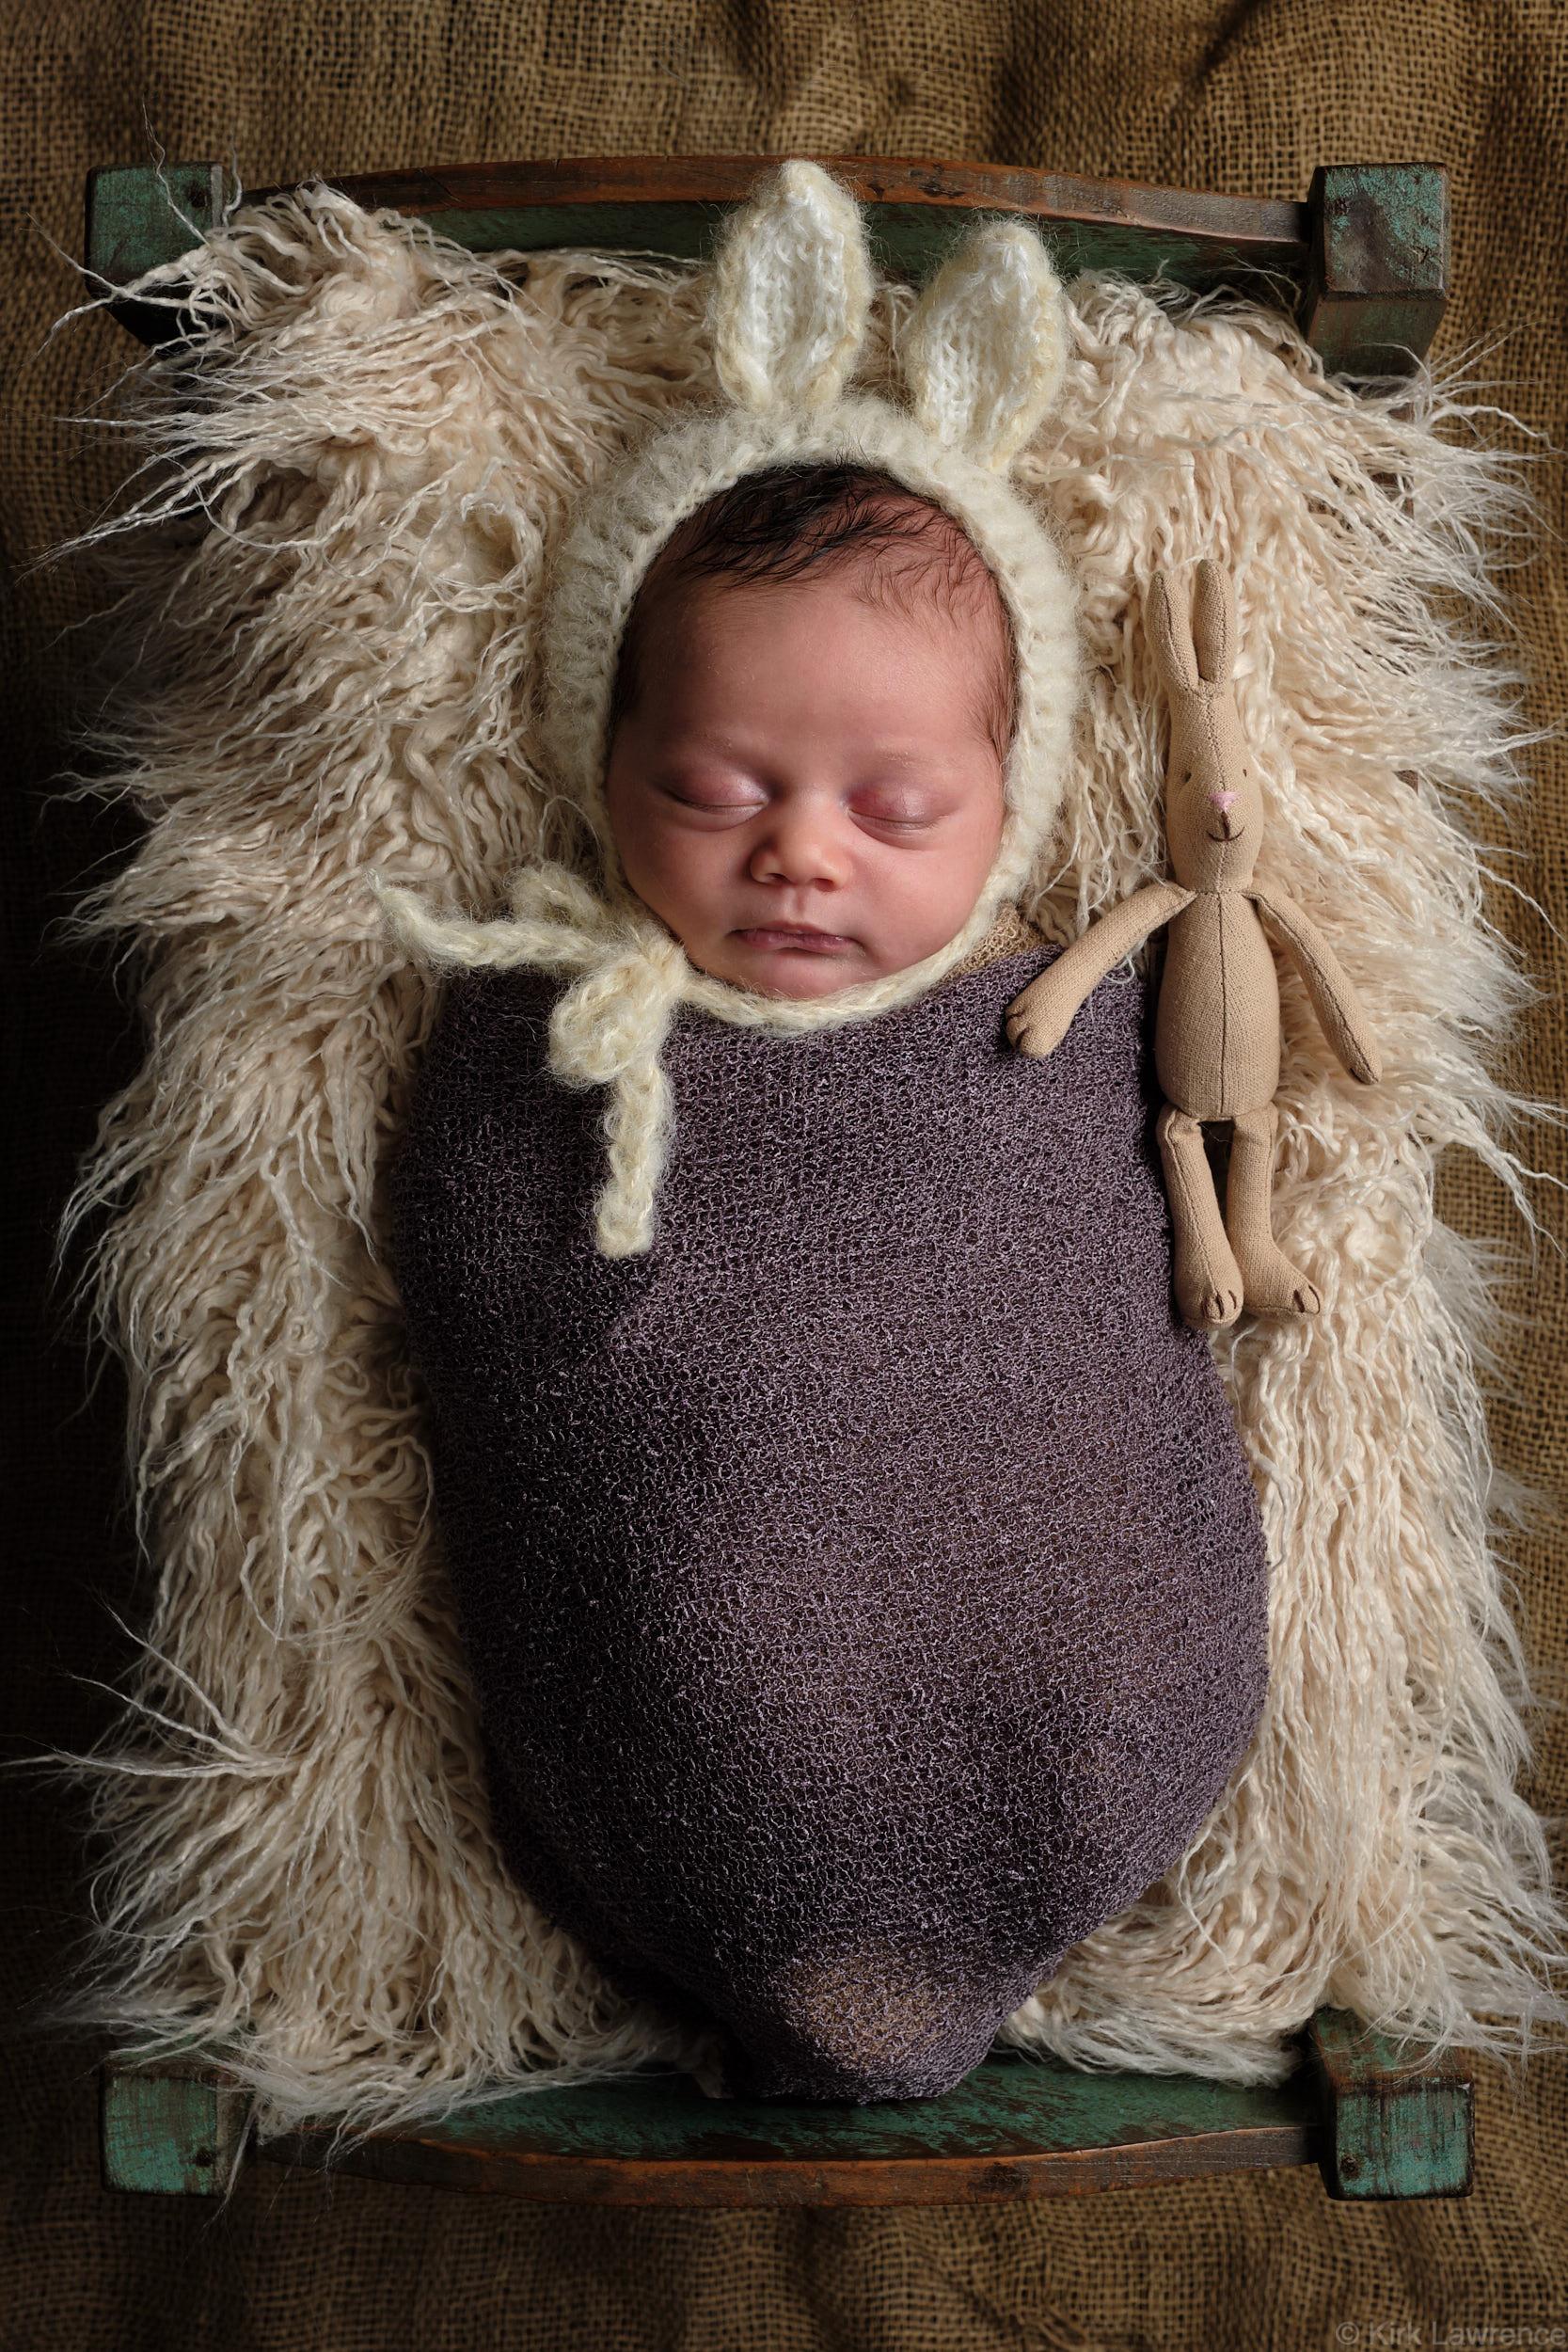 newborn_baby_sleeping_bunny_outfit.jpg